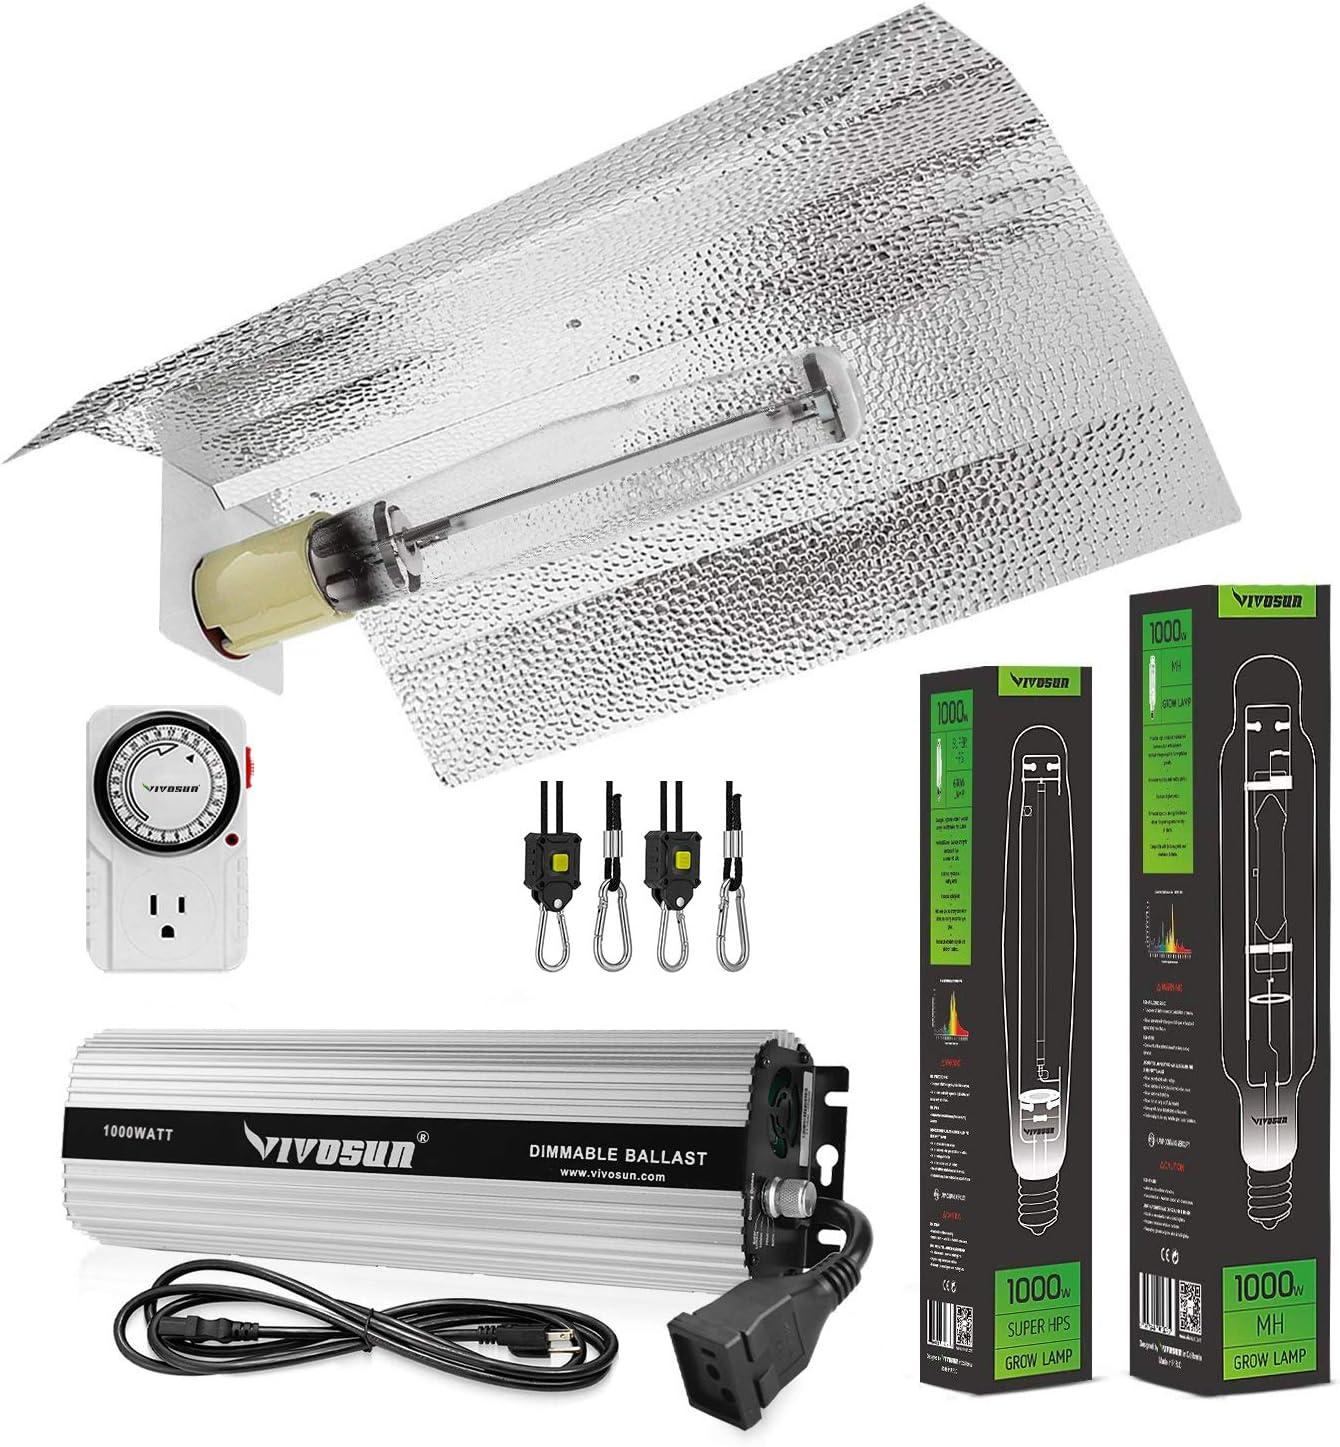 Sunlight Supply HPS MH Socket for HID Lighting 1000 watt Grow Light Room Tent